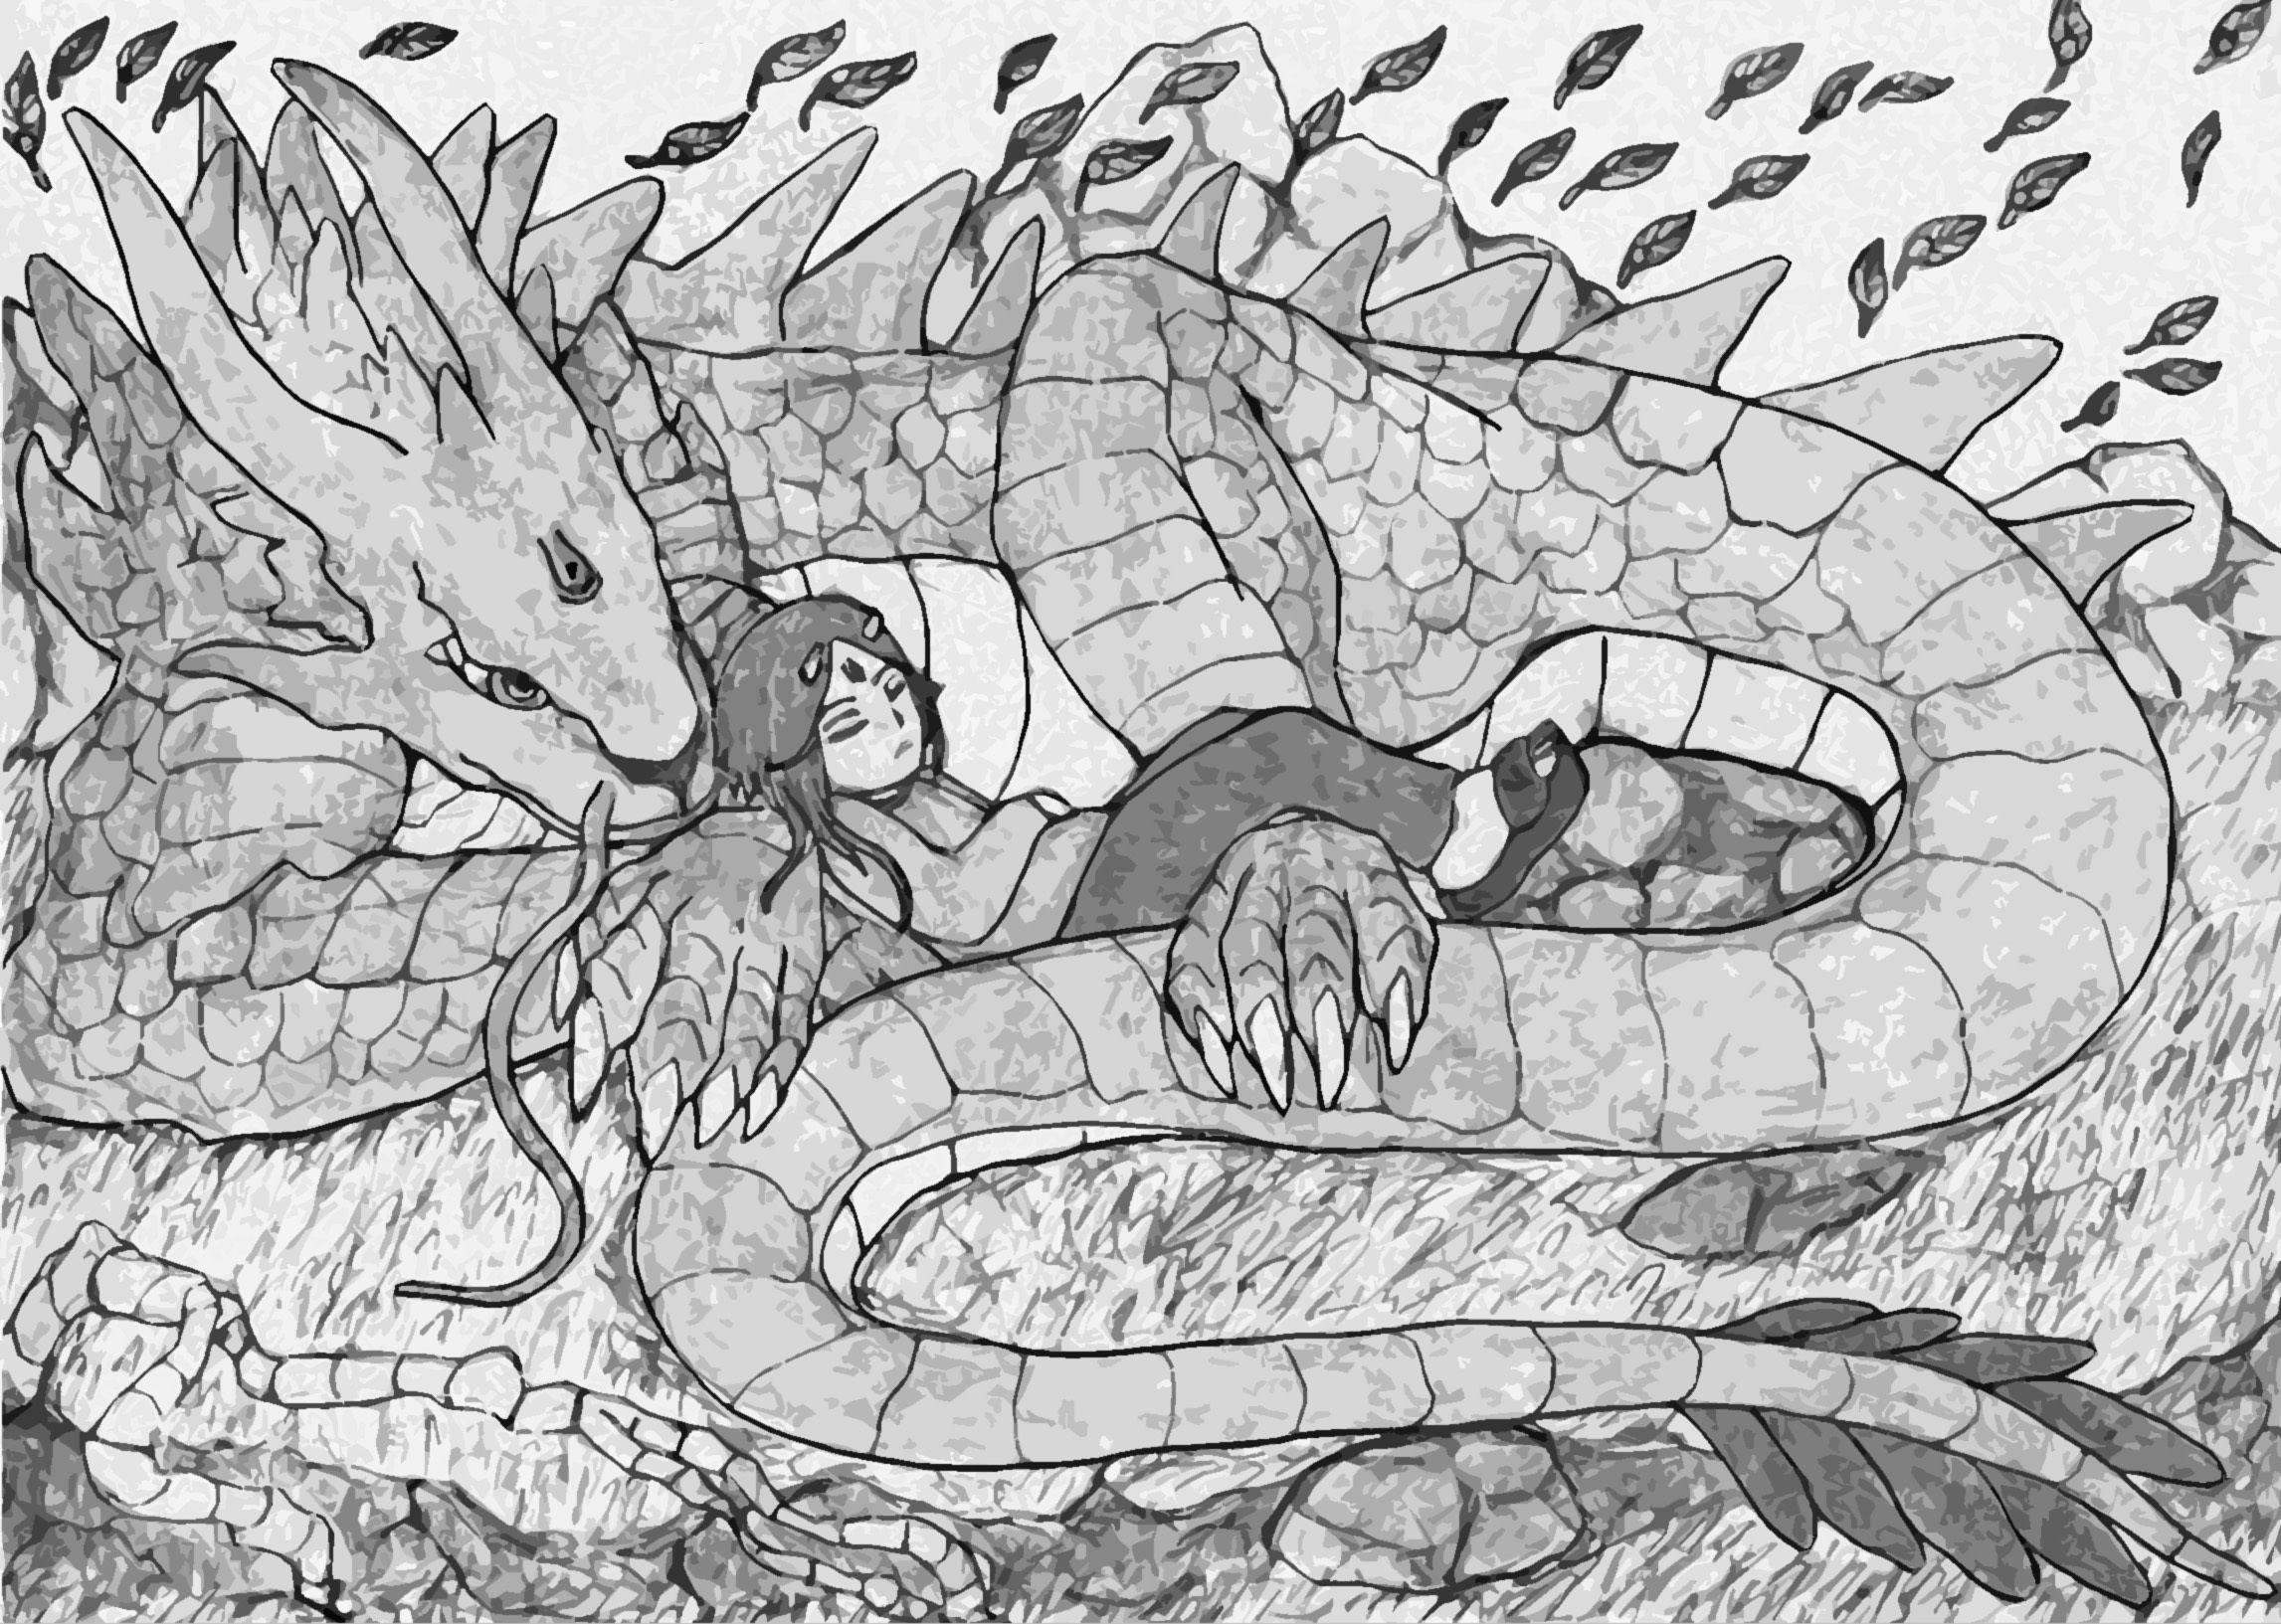 Sleeping goddess of forest and god dragon